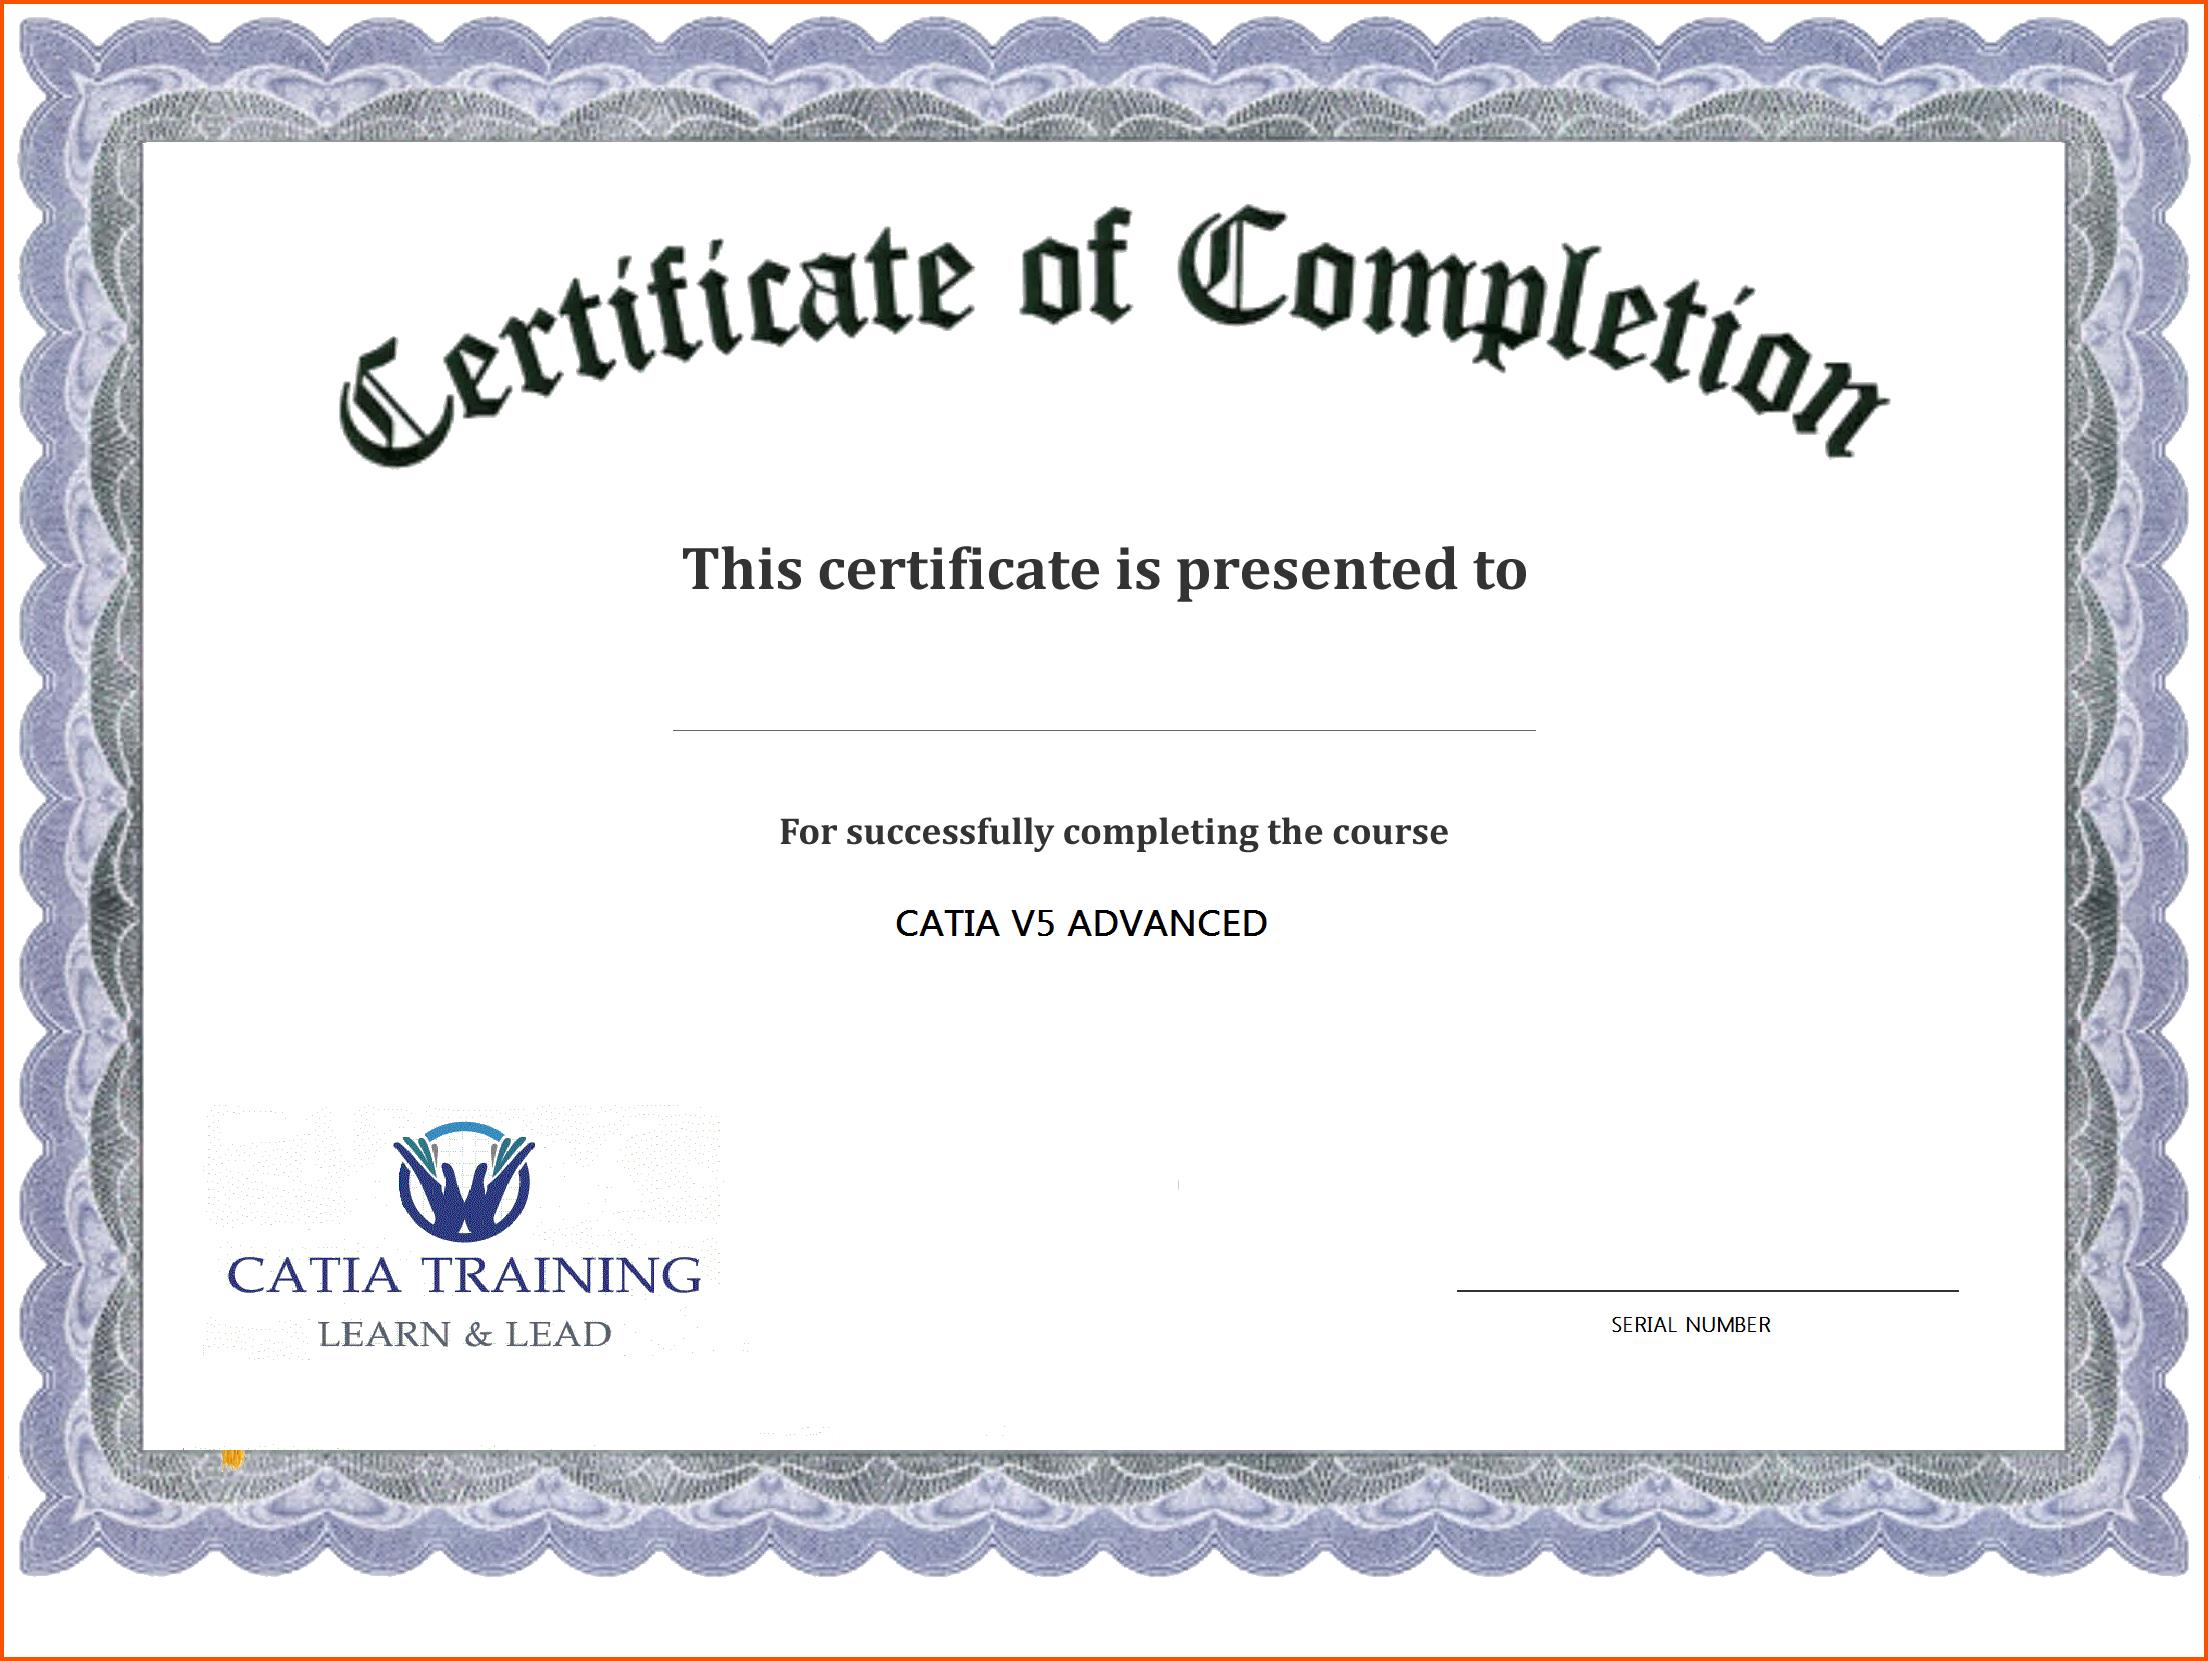 Certificate Template Free Printable - Free Download - Free Printable Blank Certificate Templates